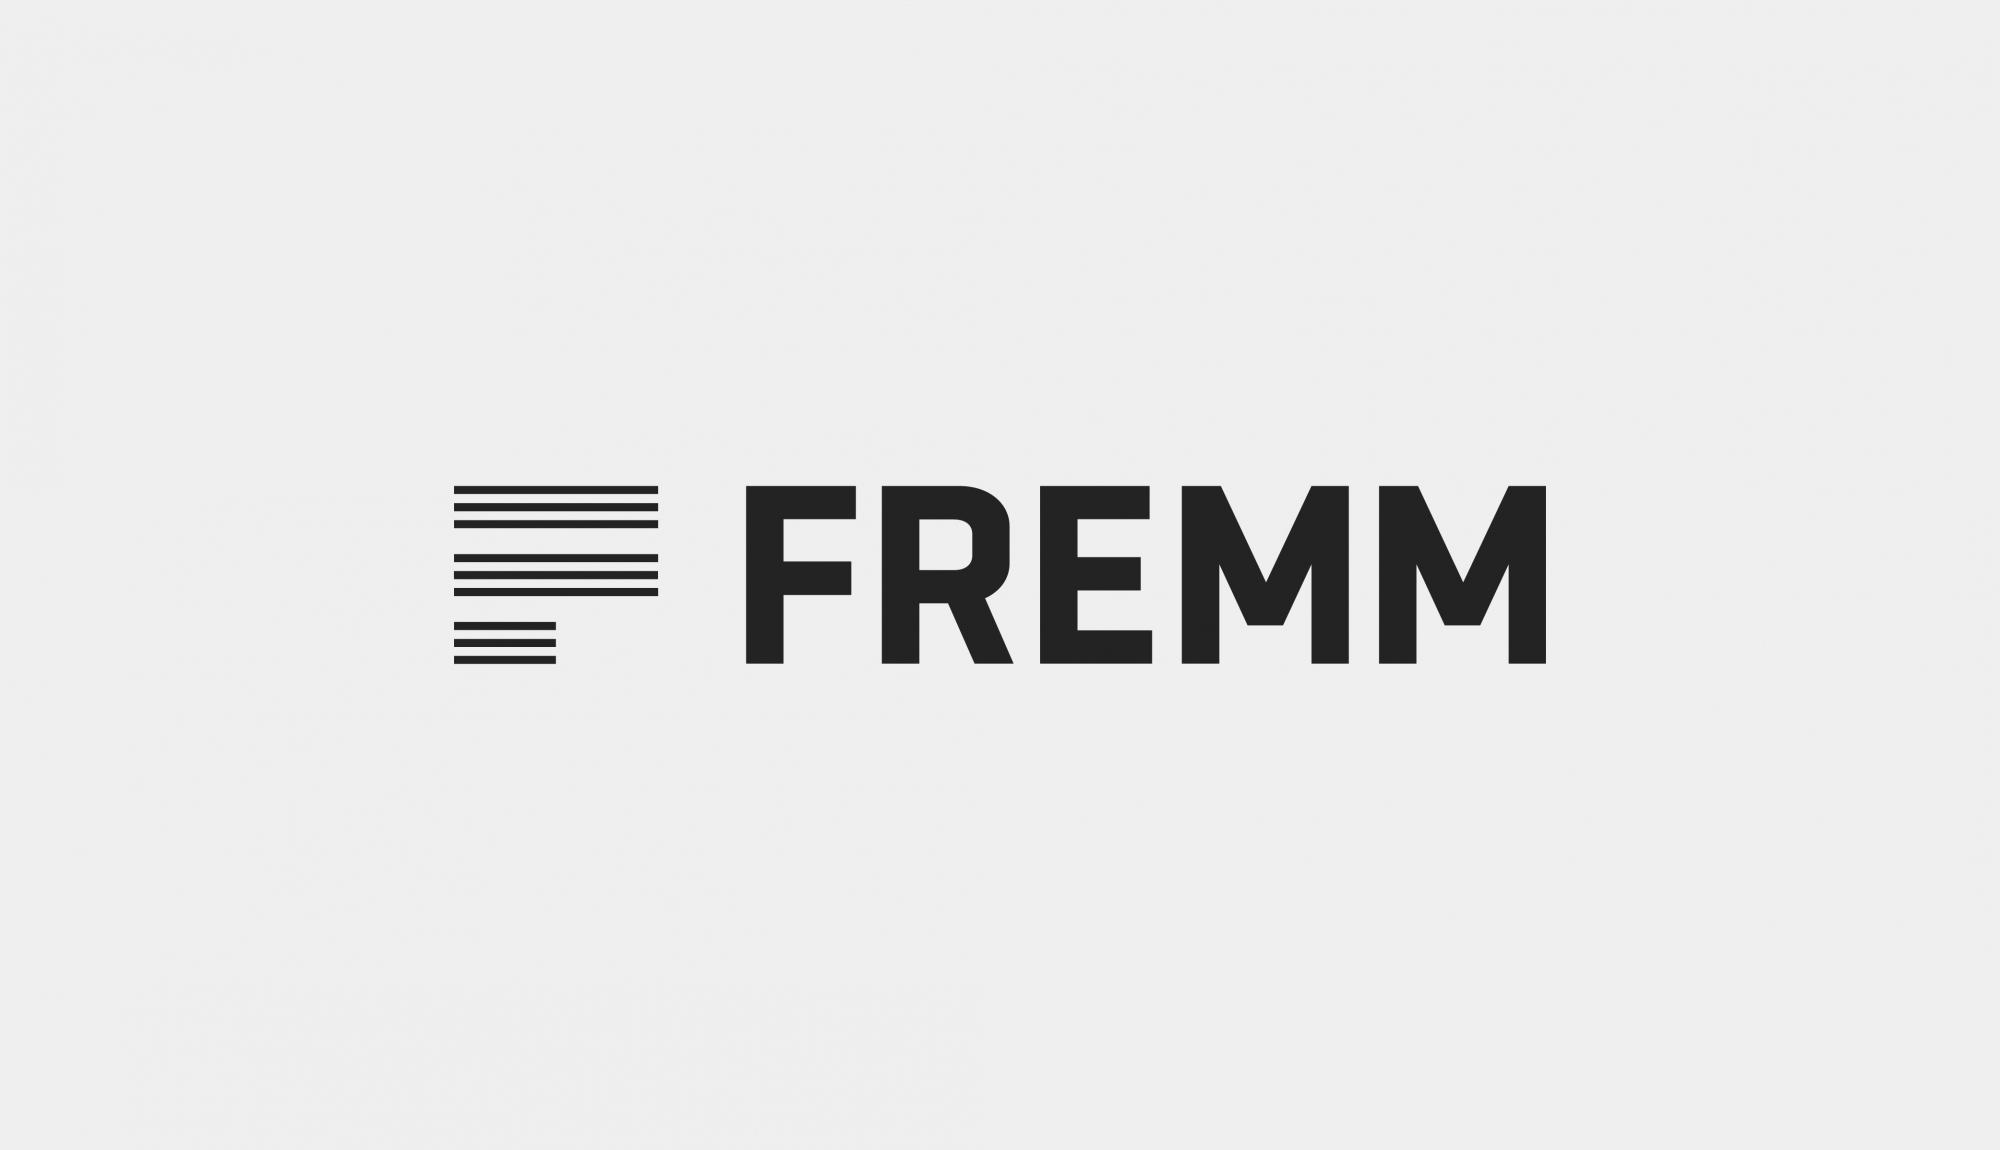 Fremm-branding-001